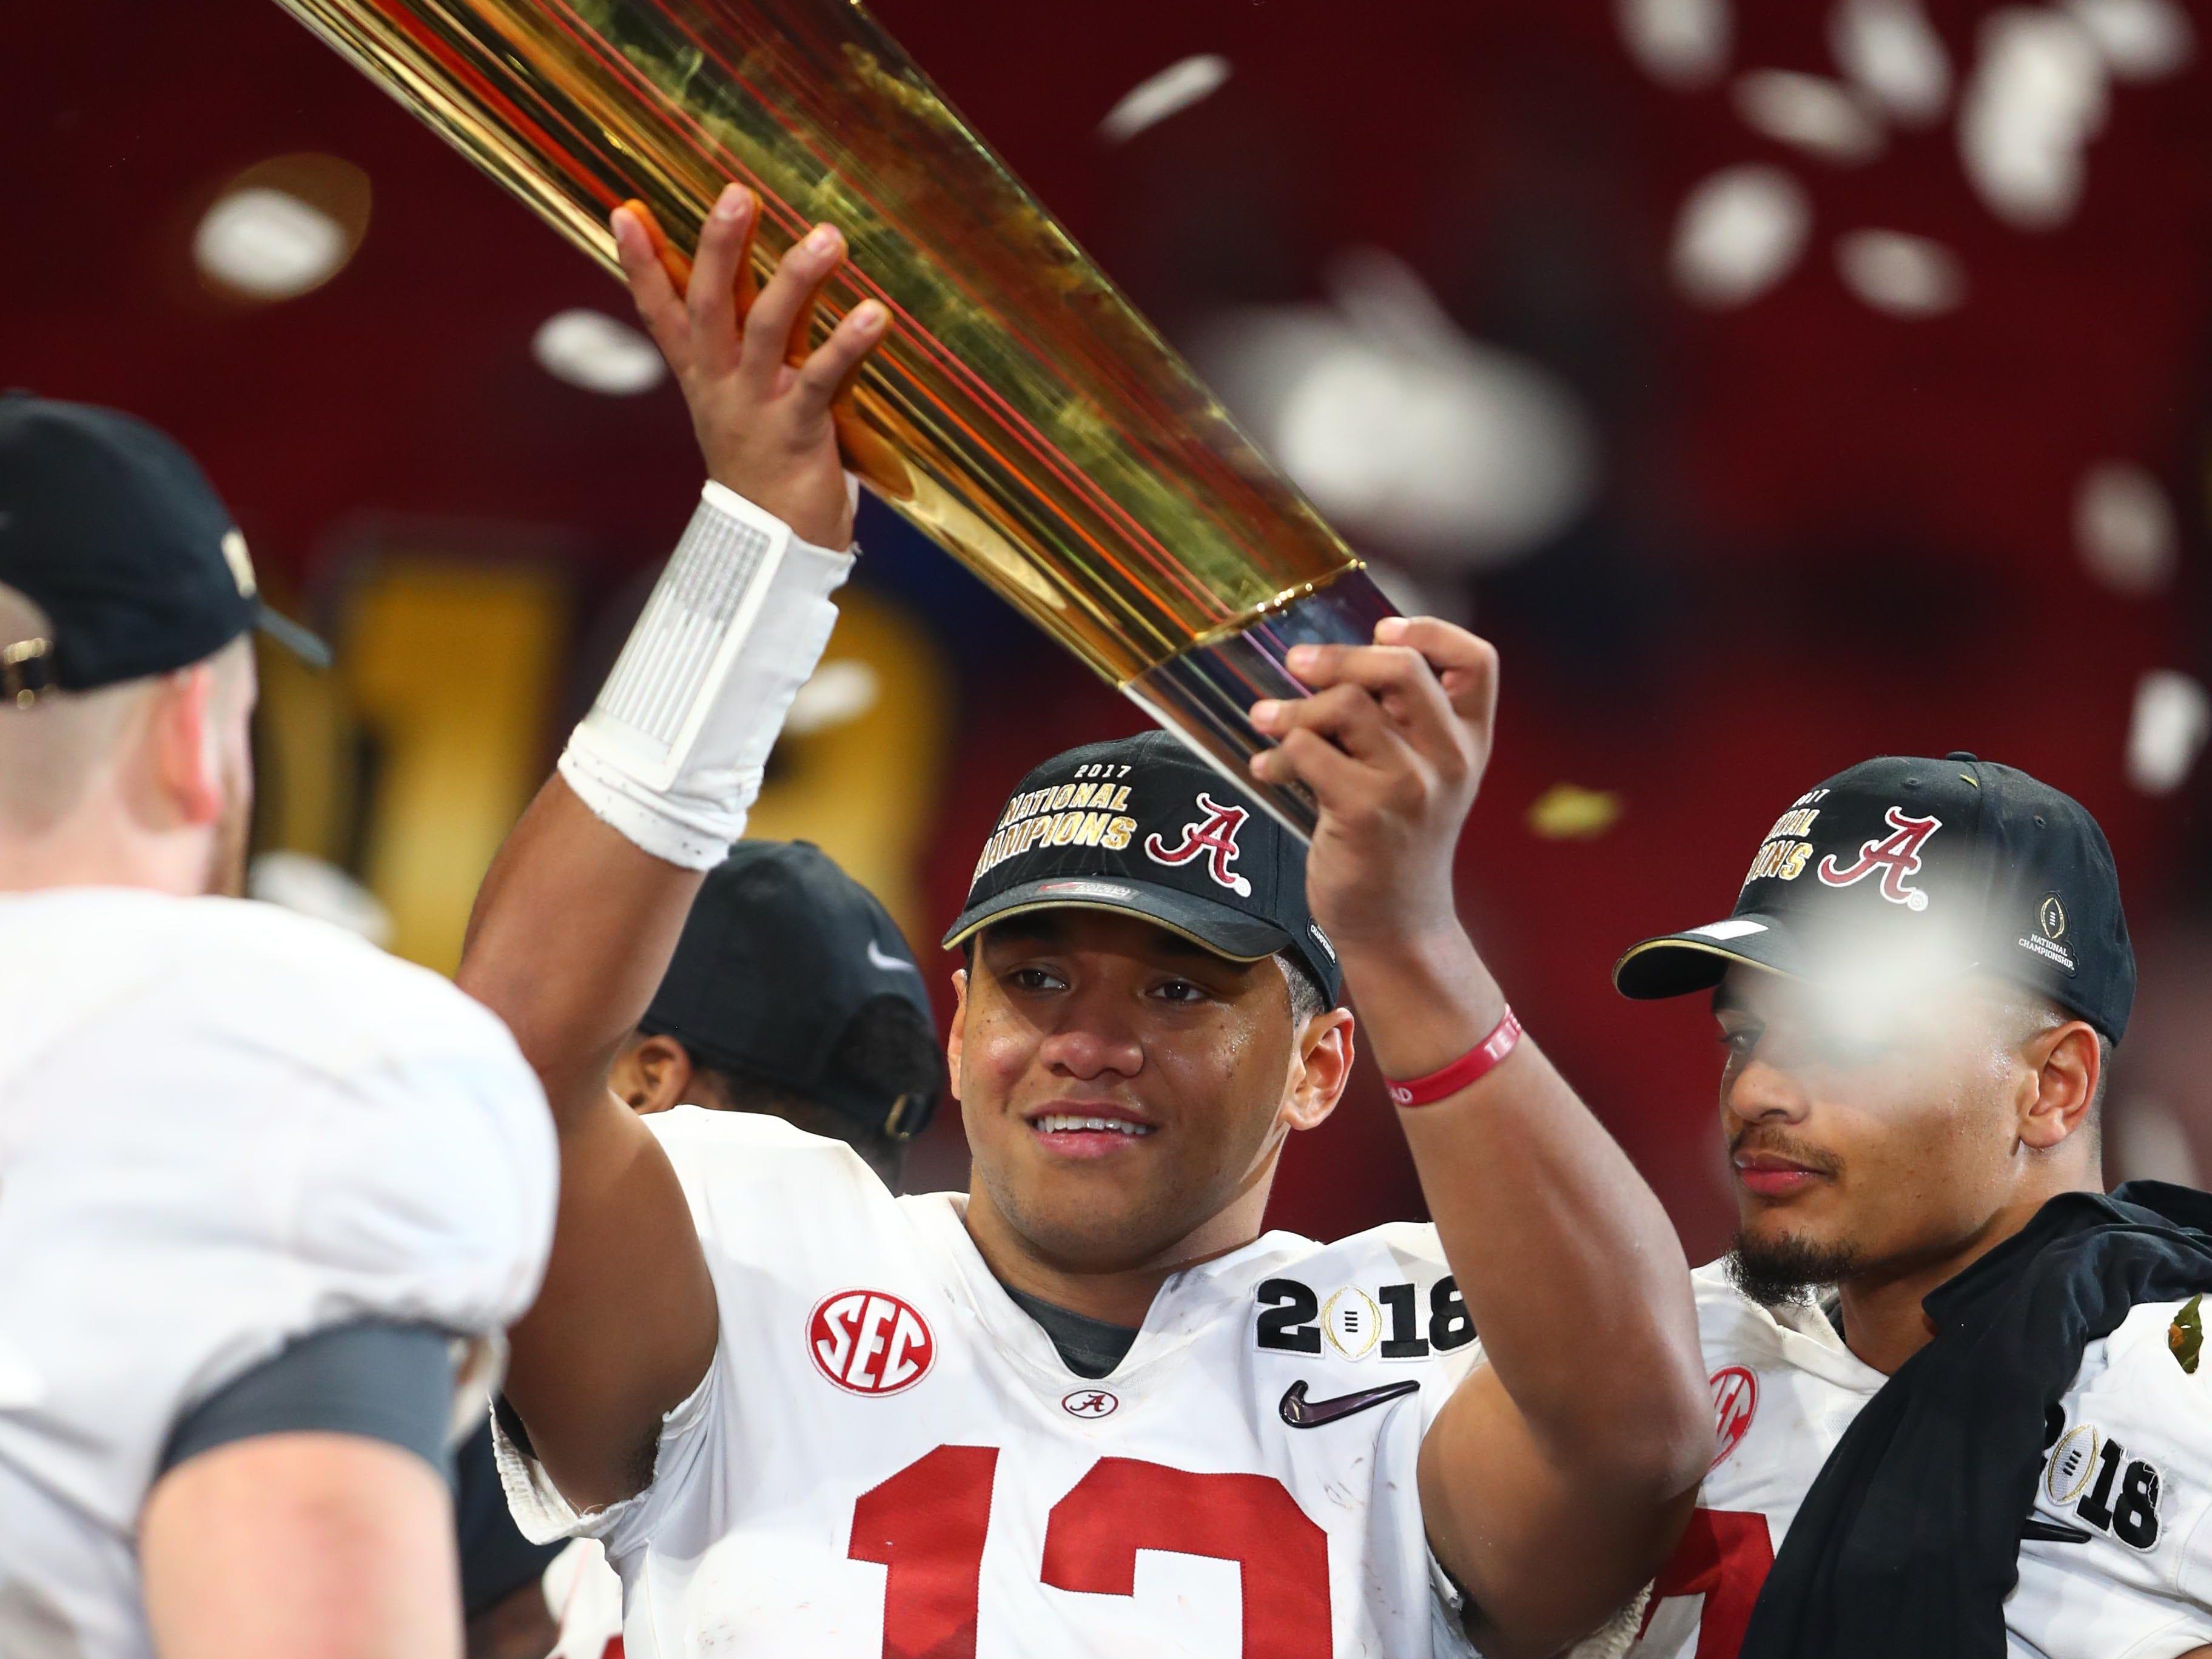 Jan 8, 2018; Atlanta, GA, USA; Alabama quarterback Tua Tagovailoa was the hero of last season's national championship game victory over Georgia.